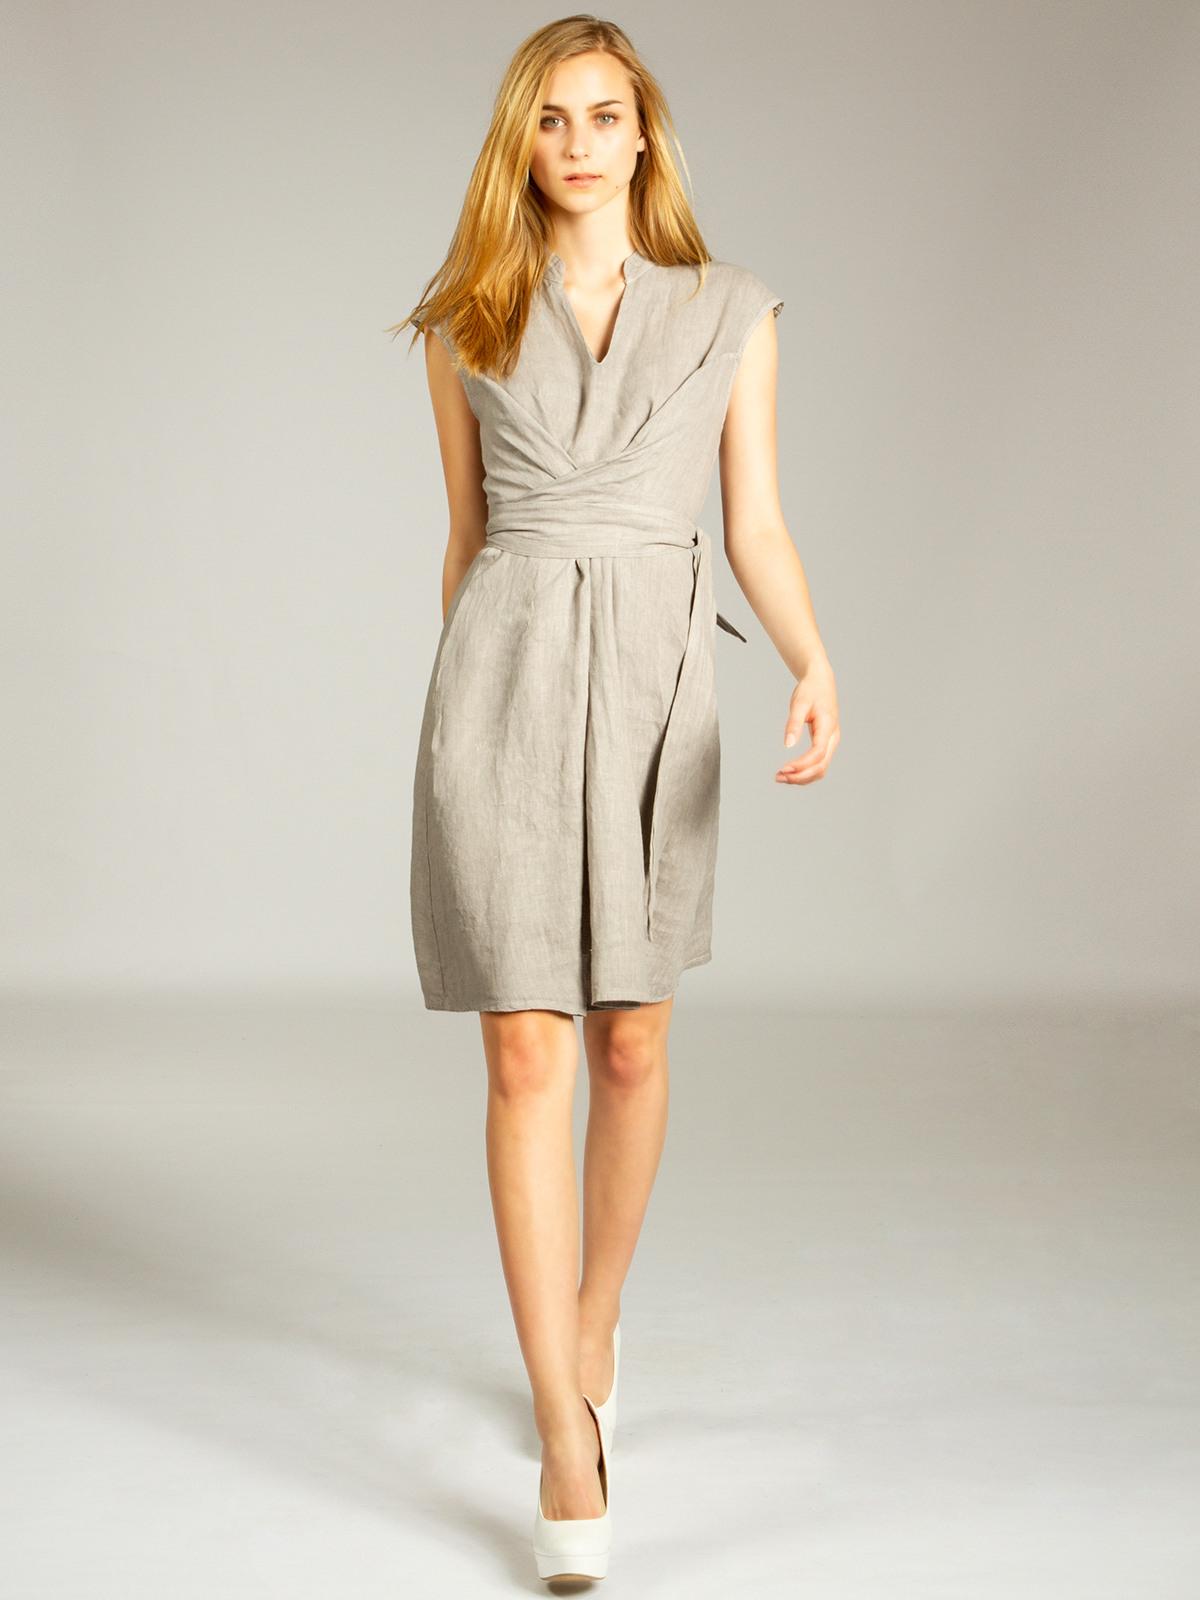 Casar Skl016 Damen Sommer Kleid Leinenkleid Knielang